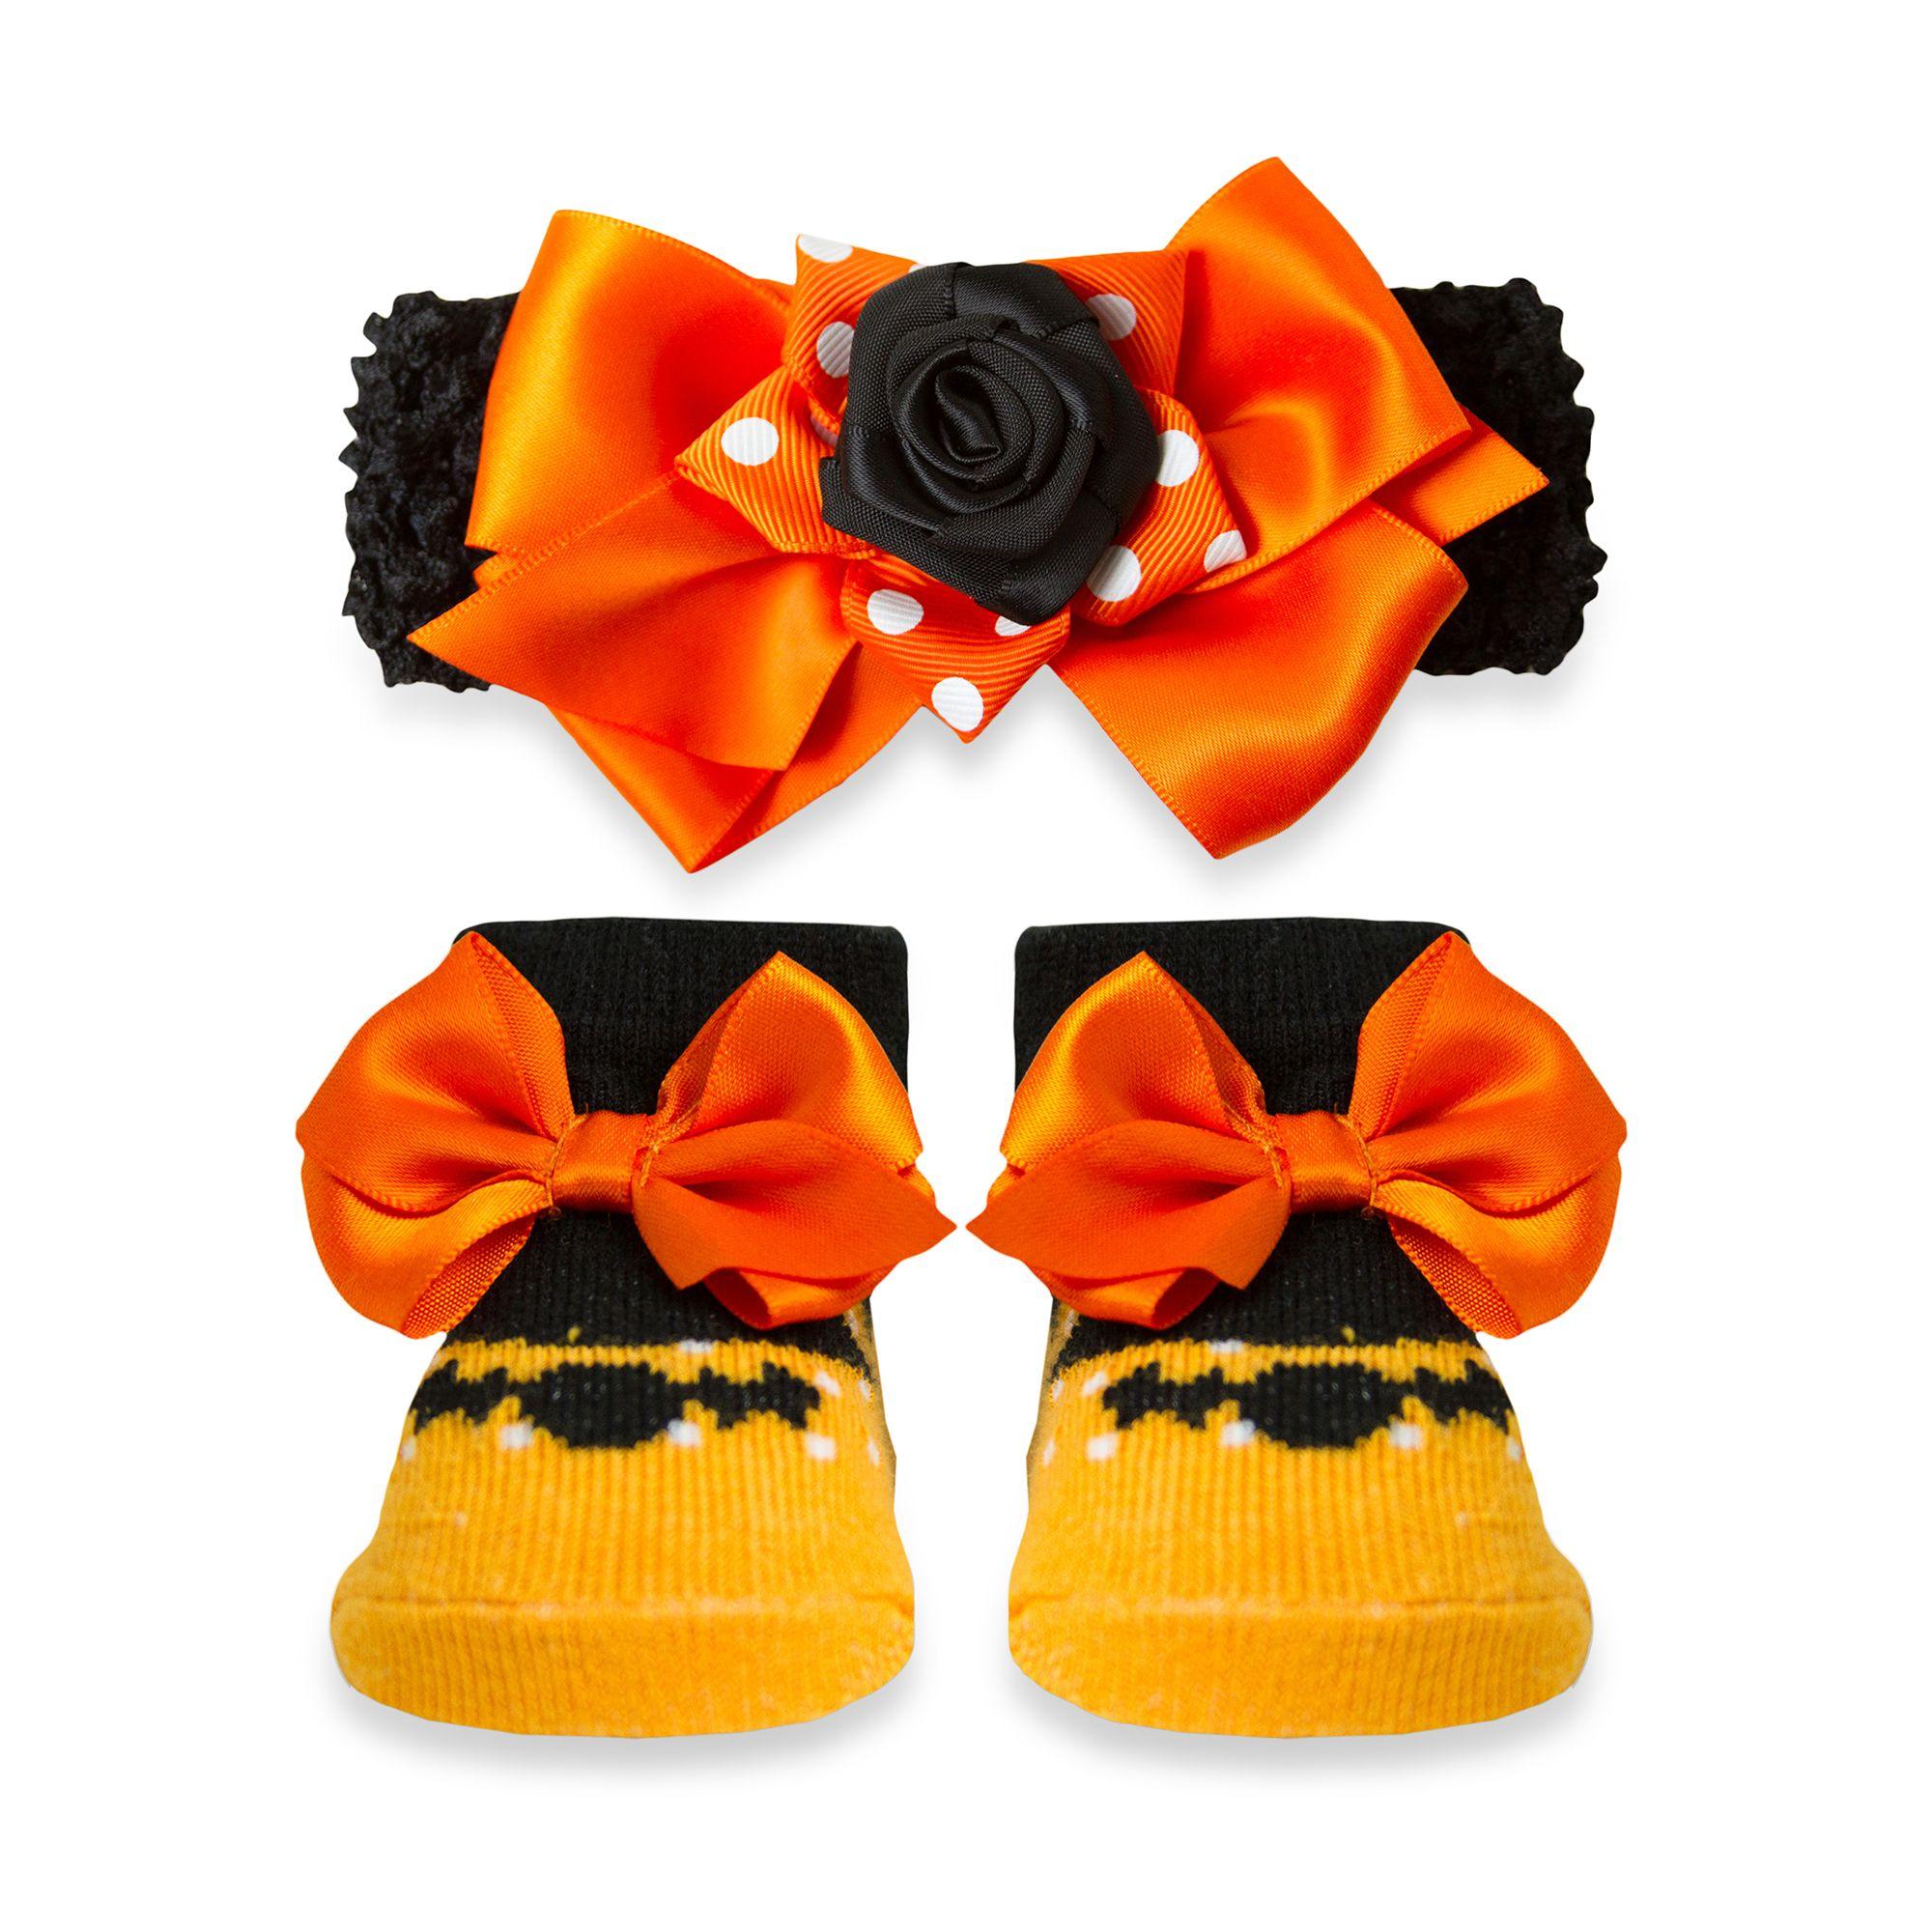 AD Sutton Halloween Novelty Bat Sock and Headband Set